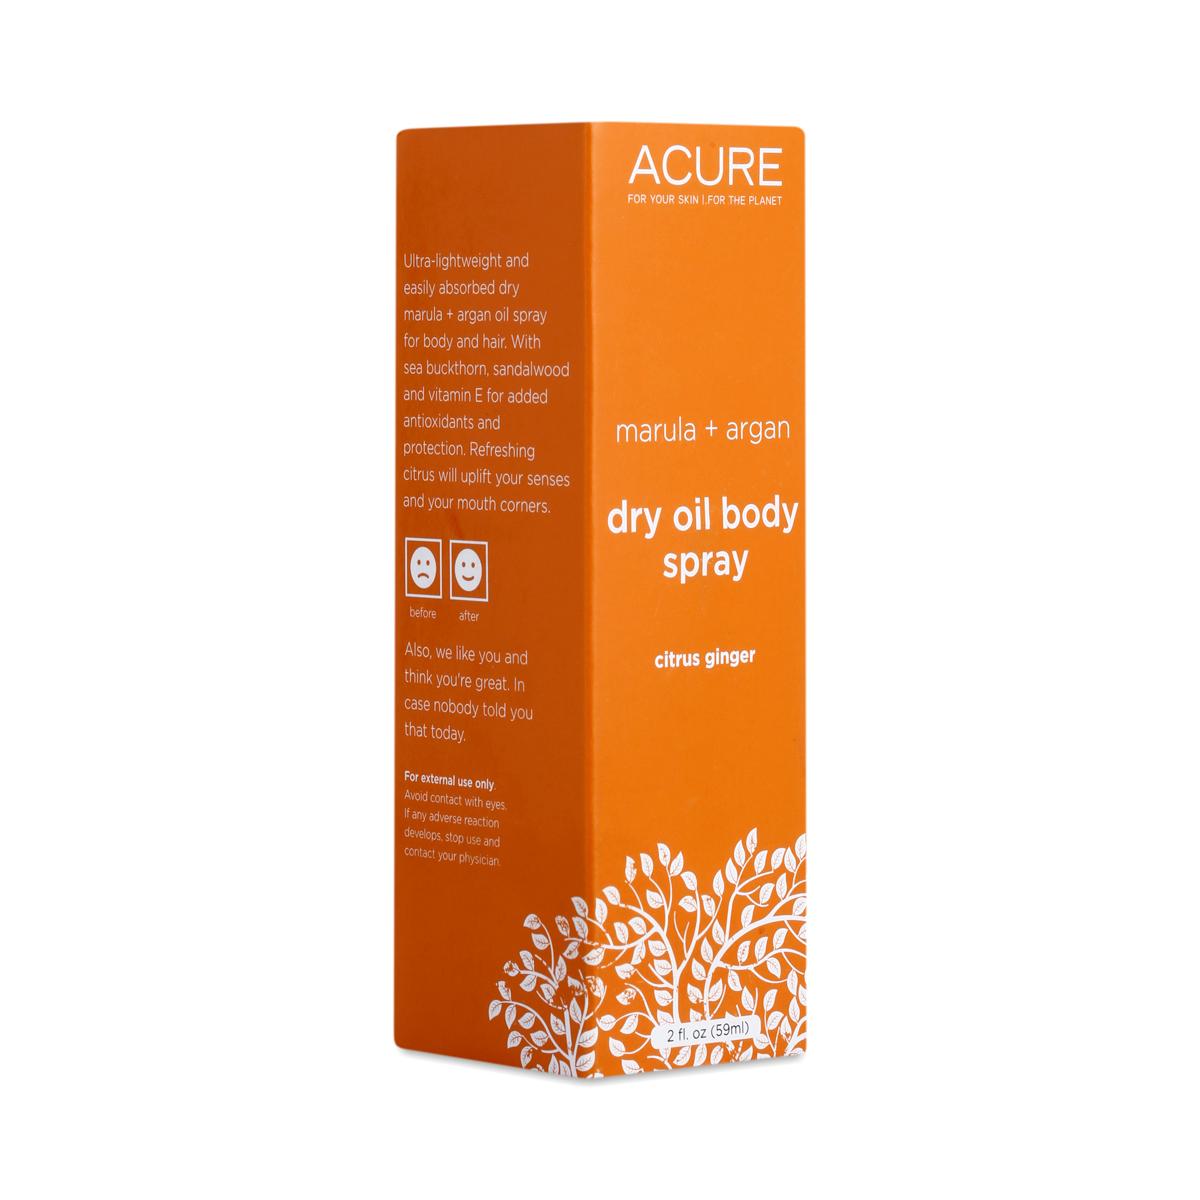 Acure Marula & Argan Dry Oil Body Spray, Citrus Ginger